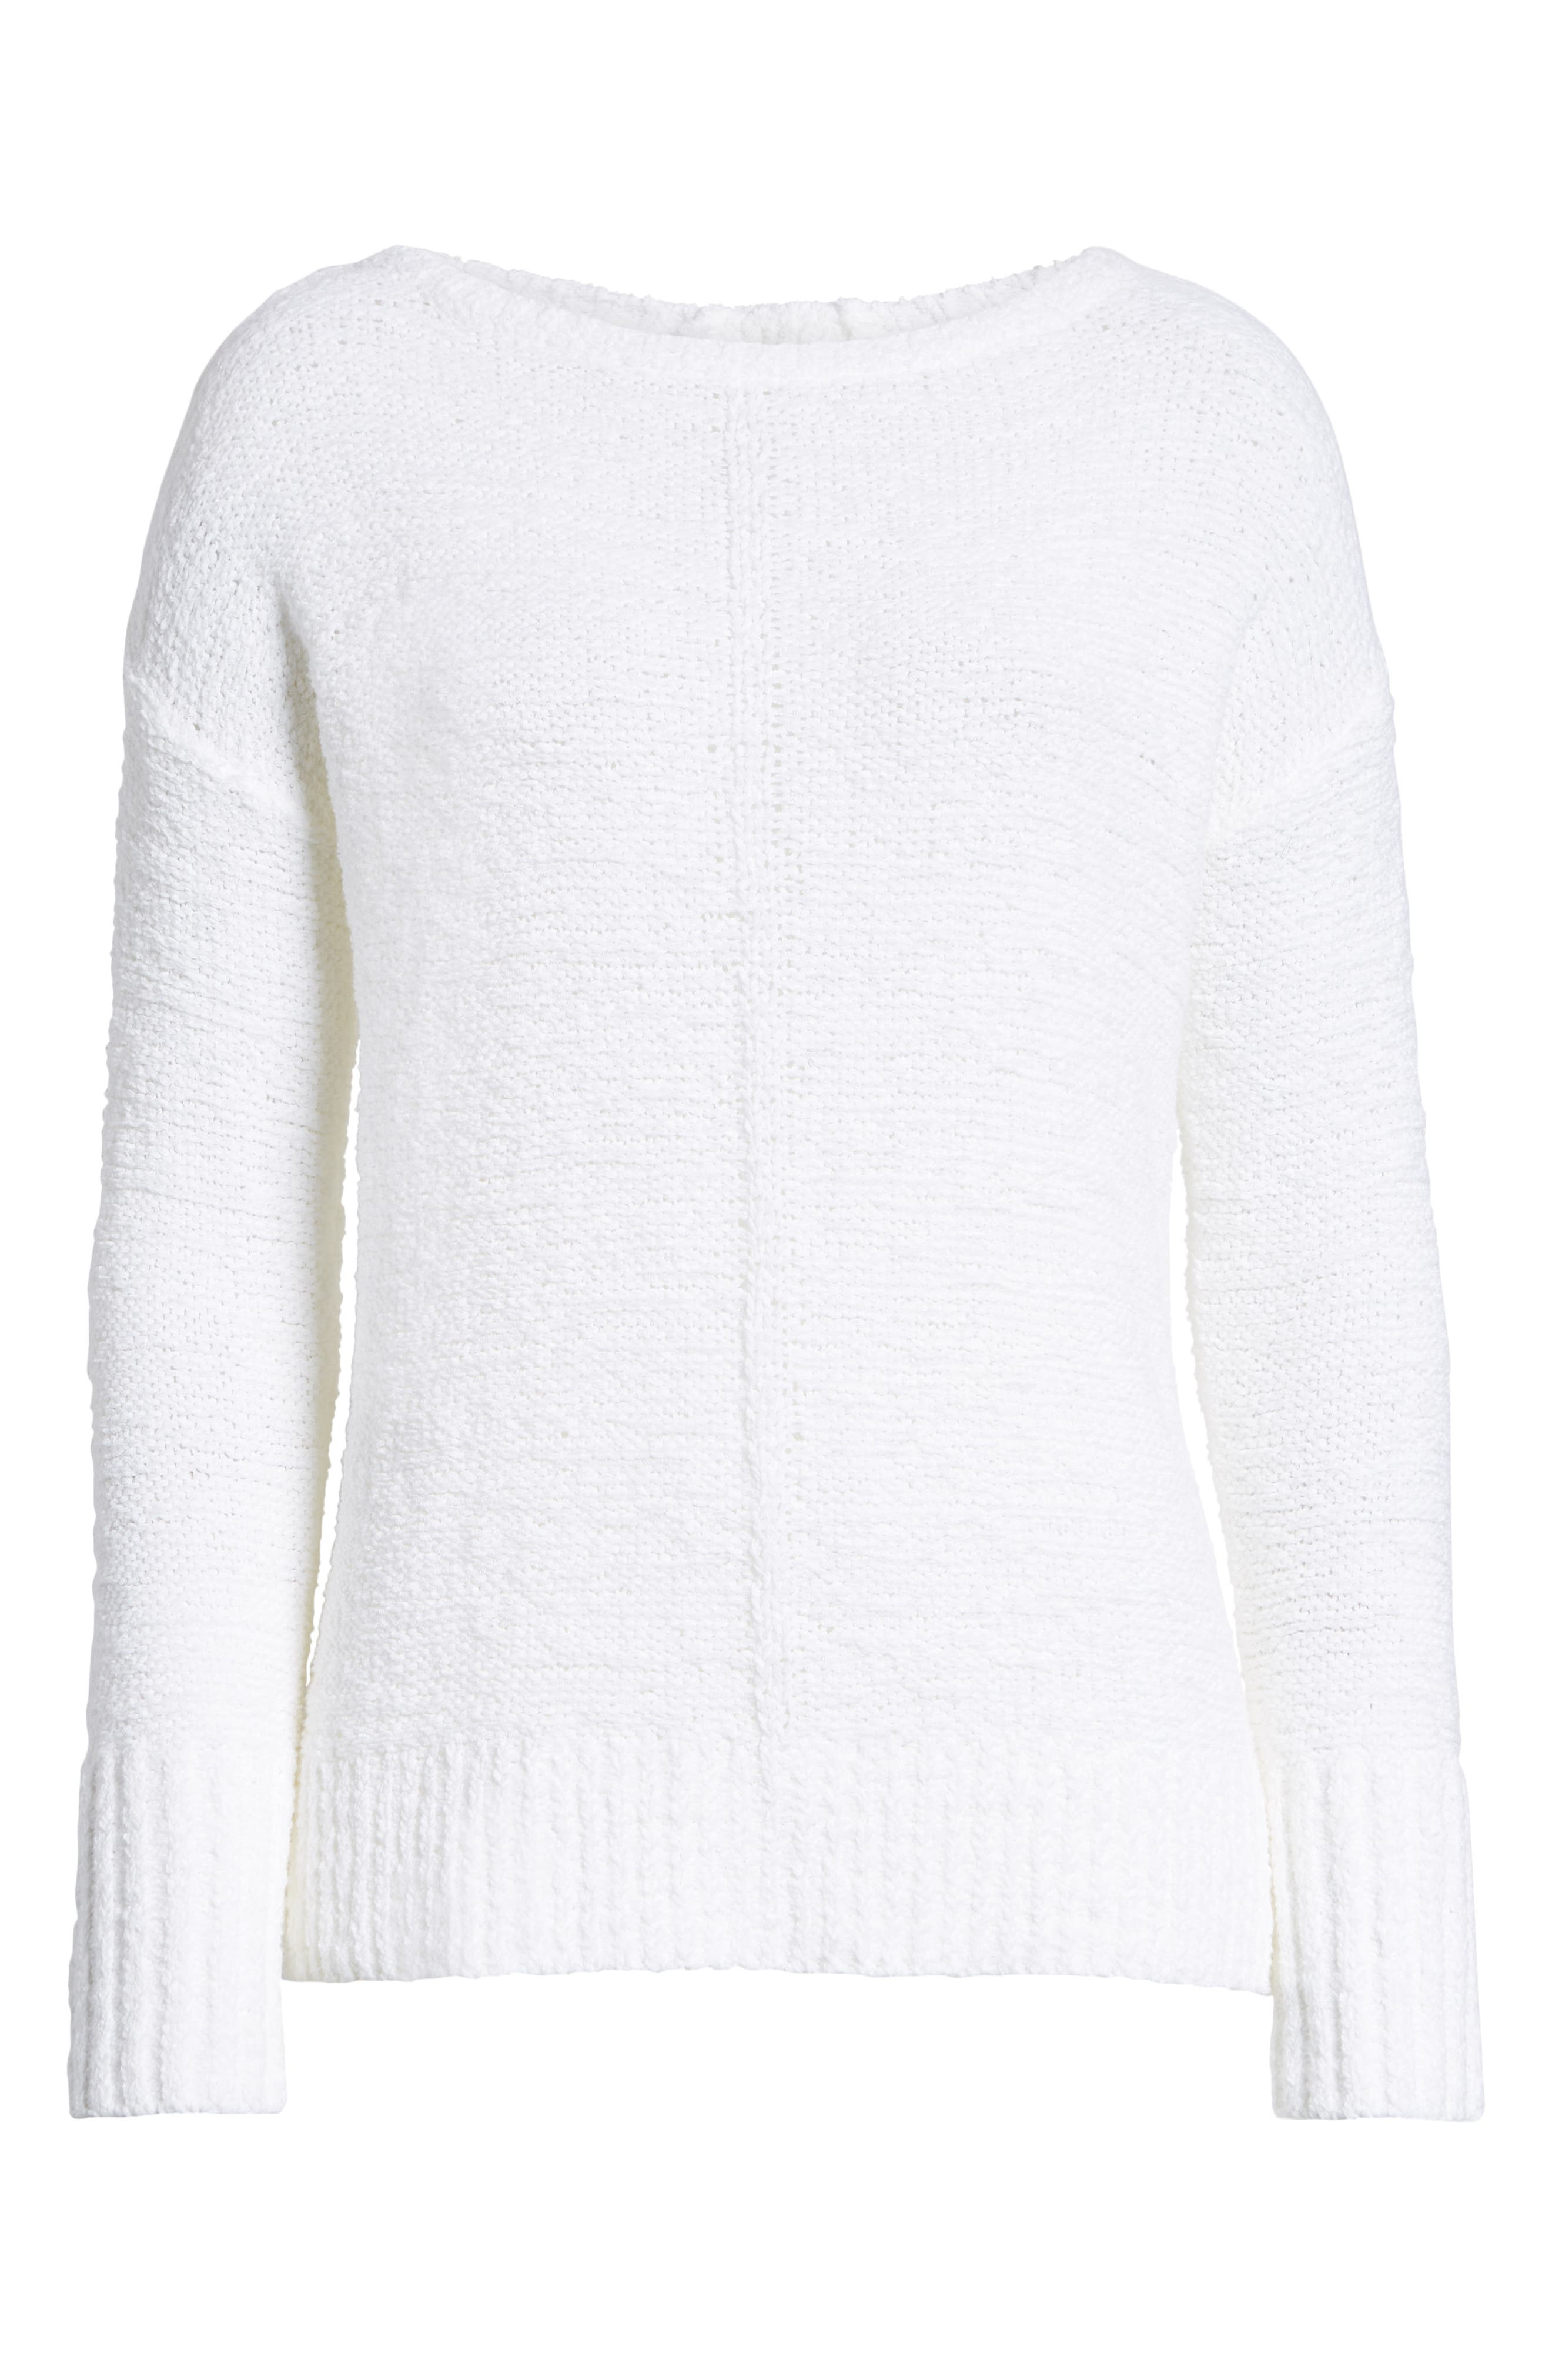 Button Back Sweater,                             Alternate thumbnail 6, color,                             WHITE